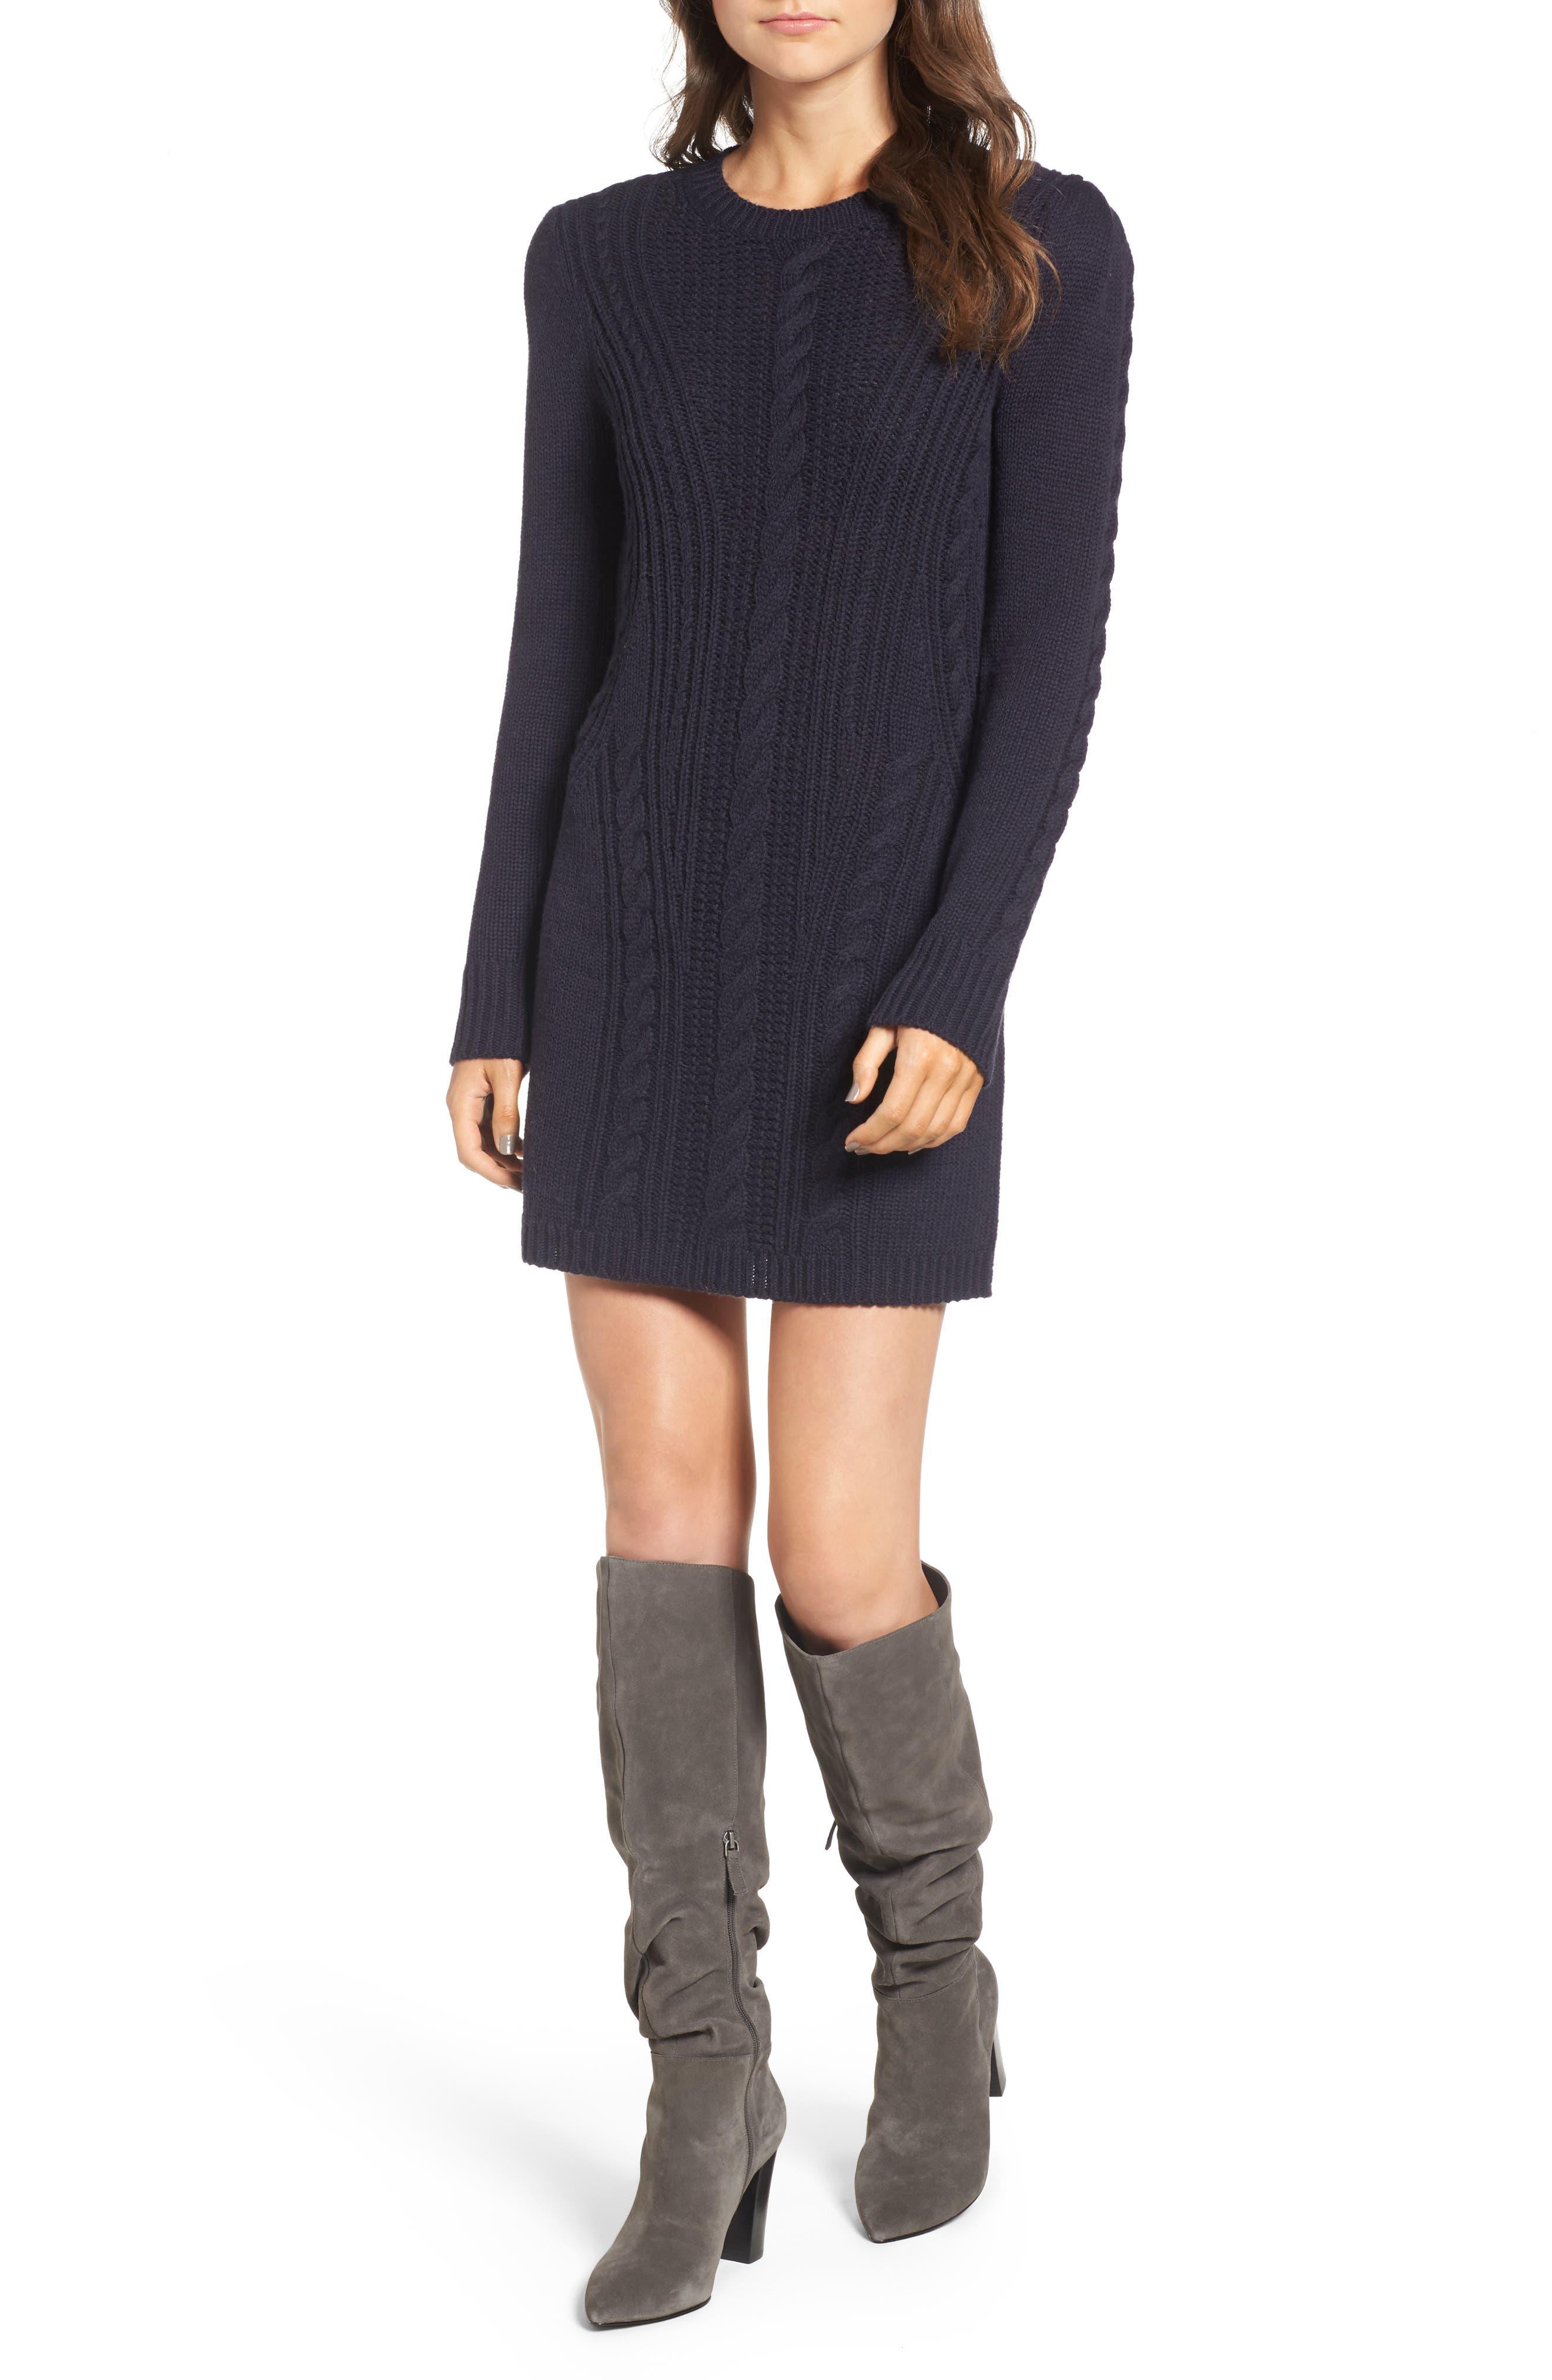 x Something Navy Sweater Dress,                         Main,                         color, Navy Night